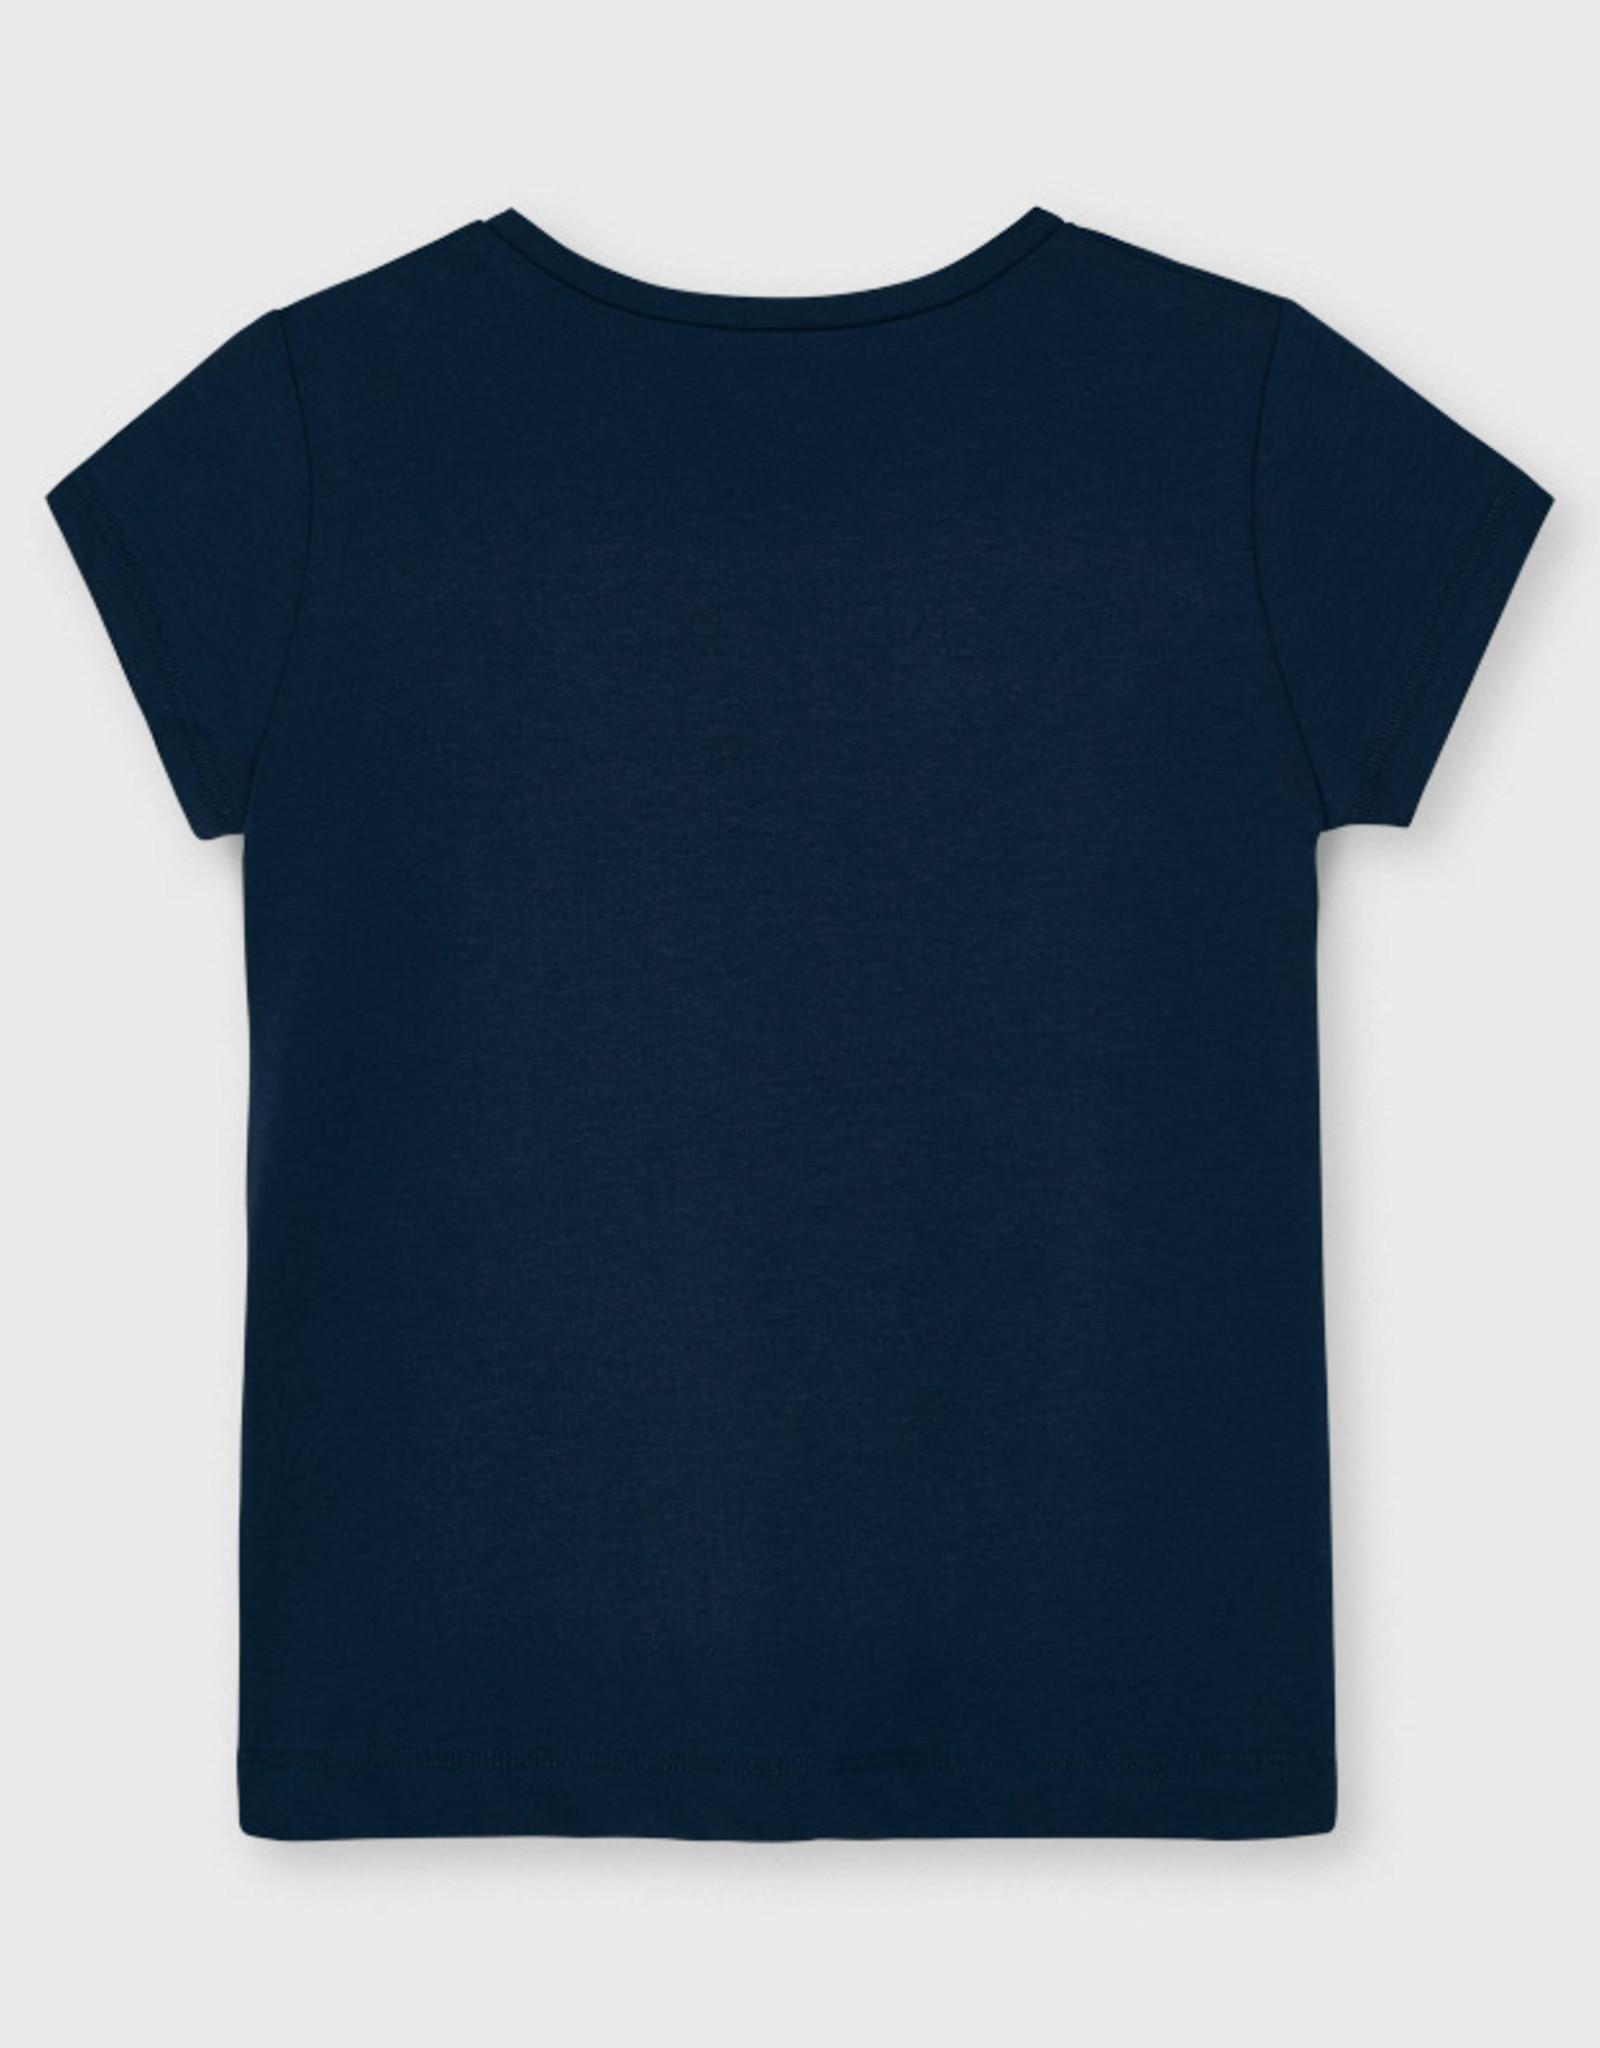 Mayoral Dpnkerblauwe ecofriends t-shirt